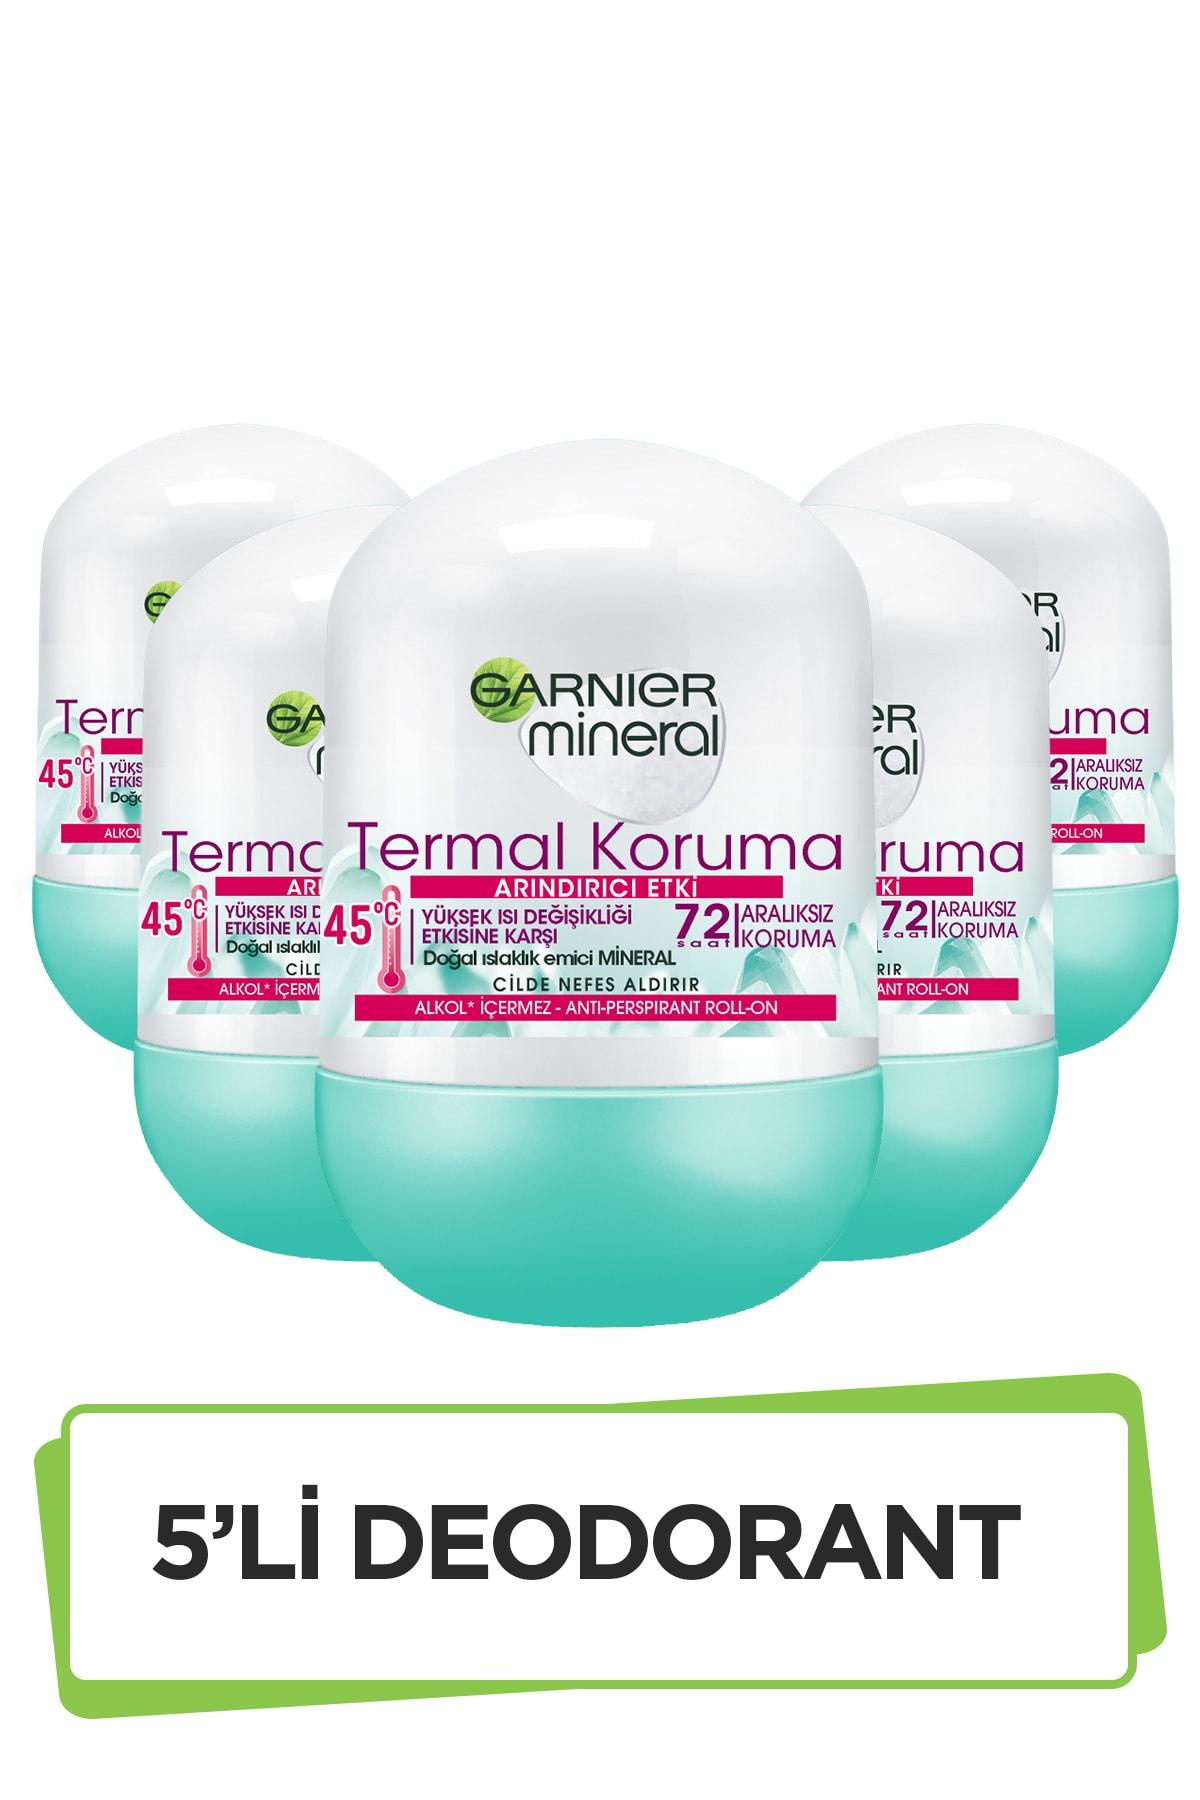 Garnier 5'li Garnier Mineral Termal Koruma Roll-On Deodorant Seti 36005419289305 1